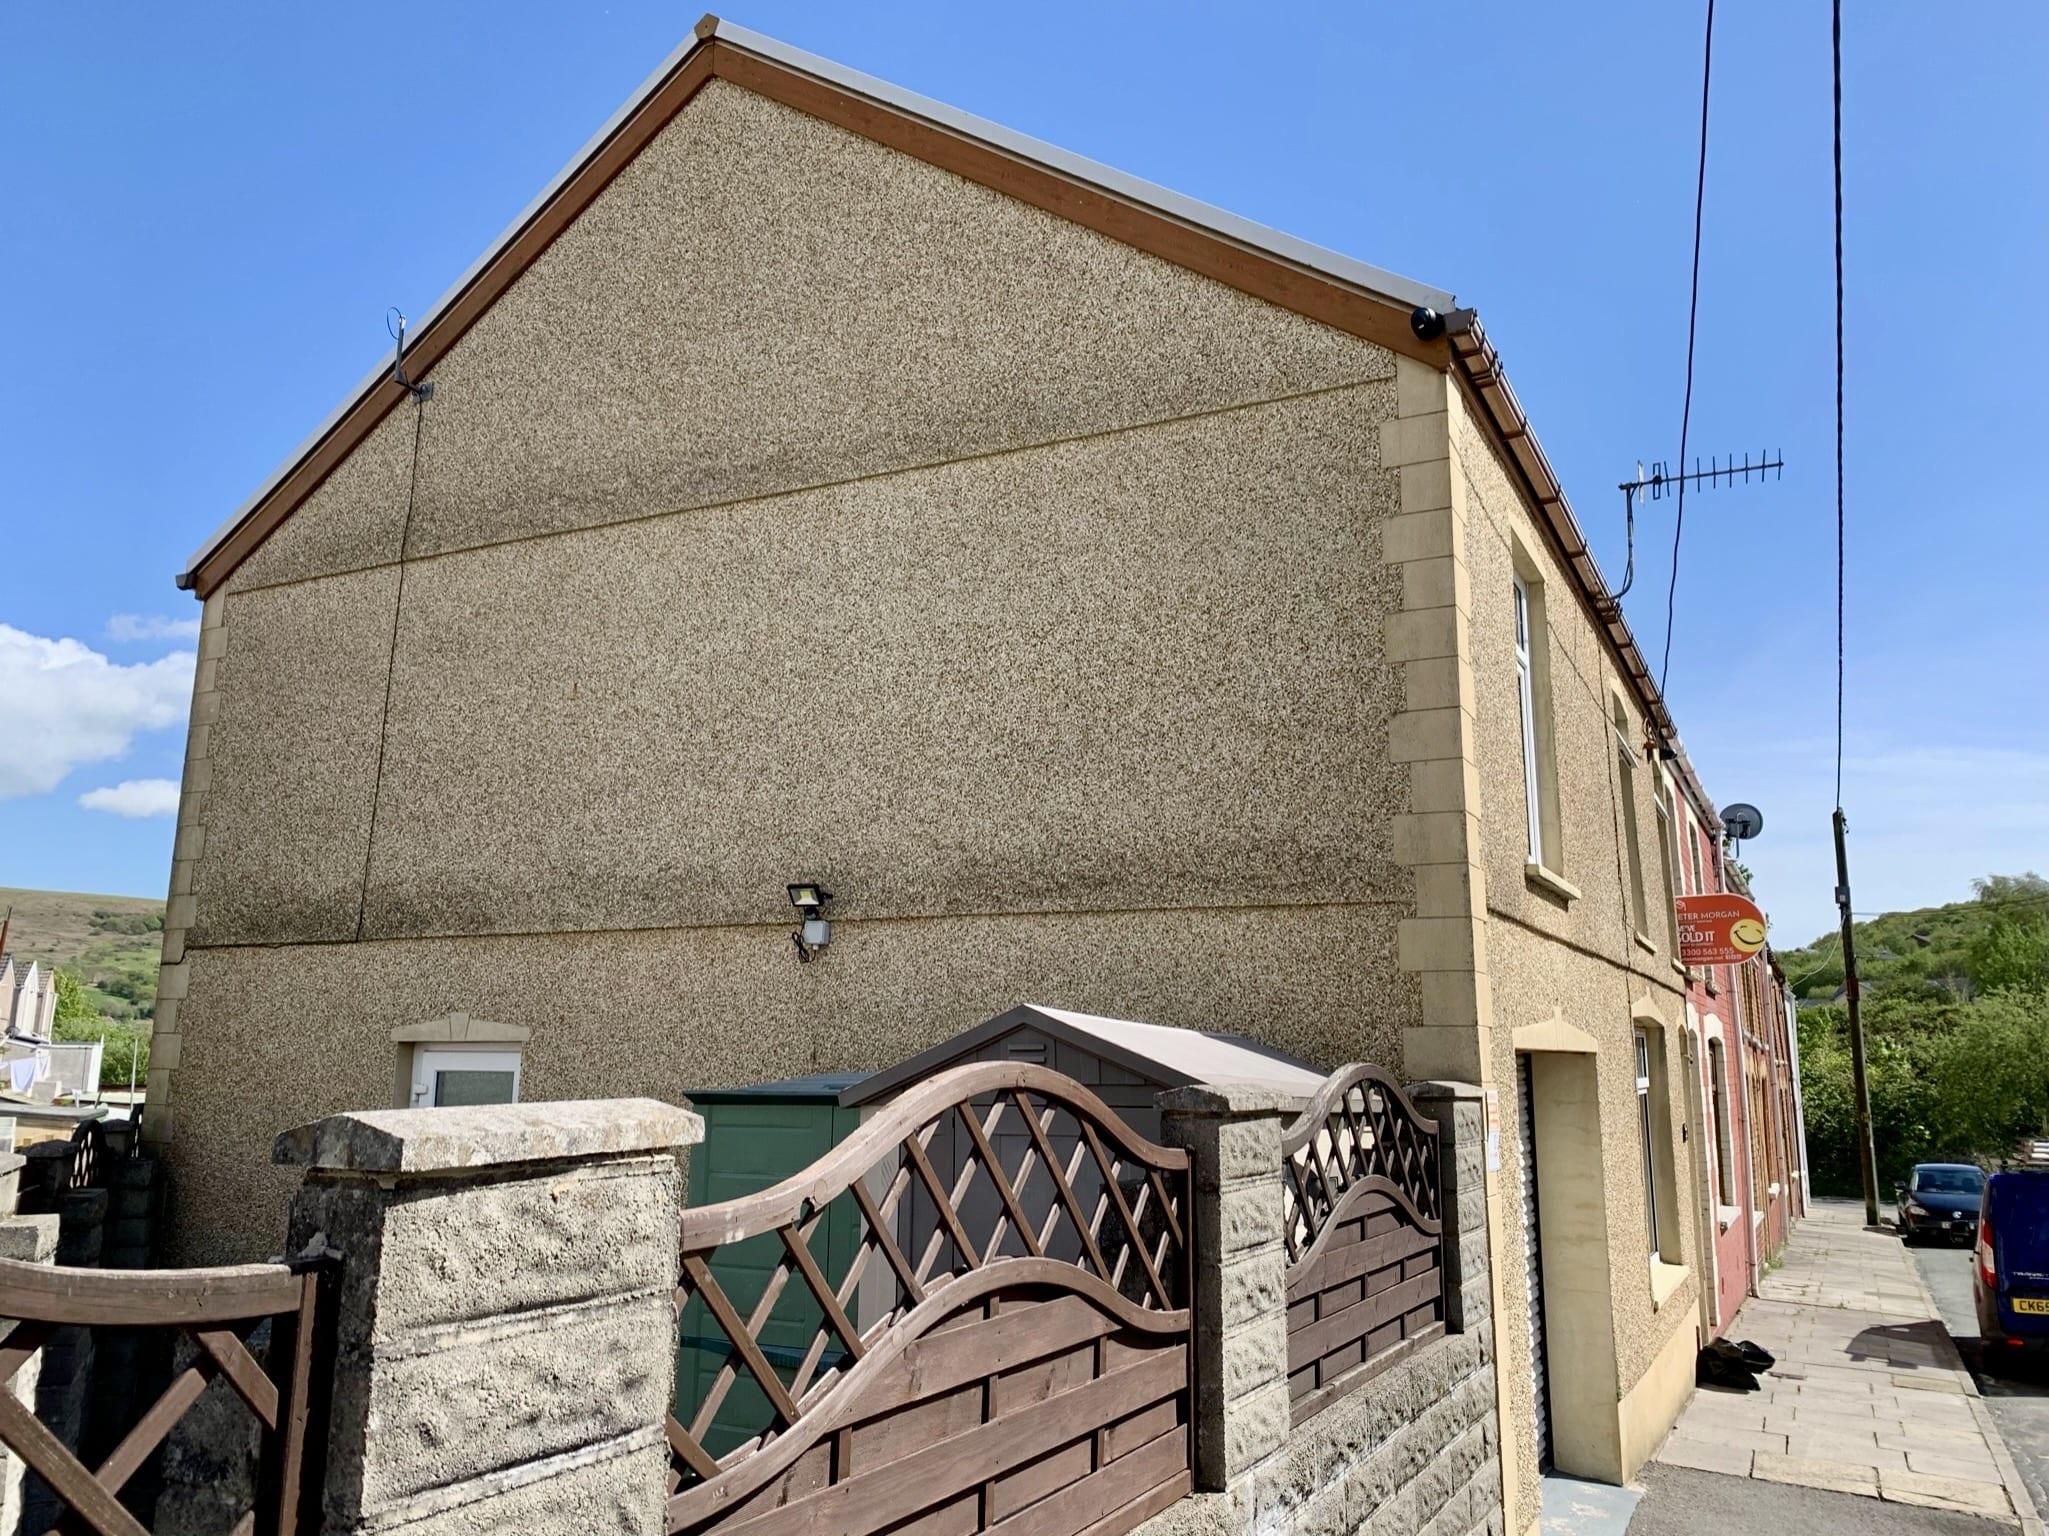 CCTV cameras on house